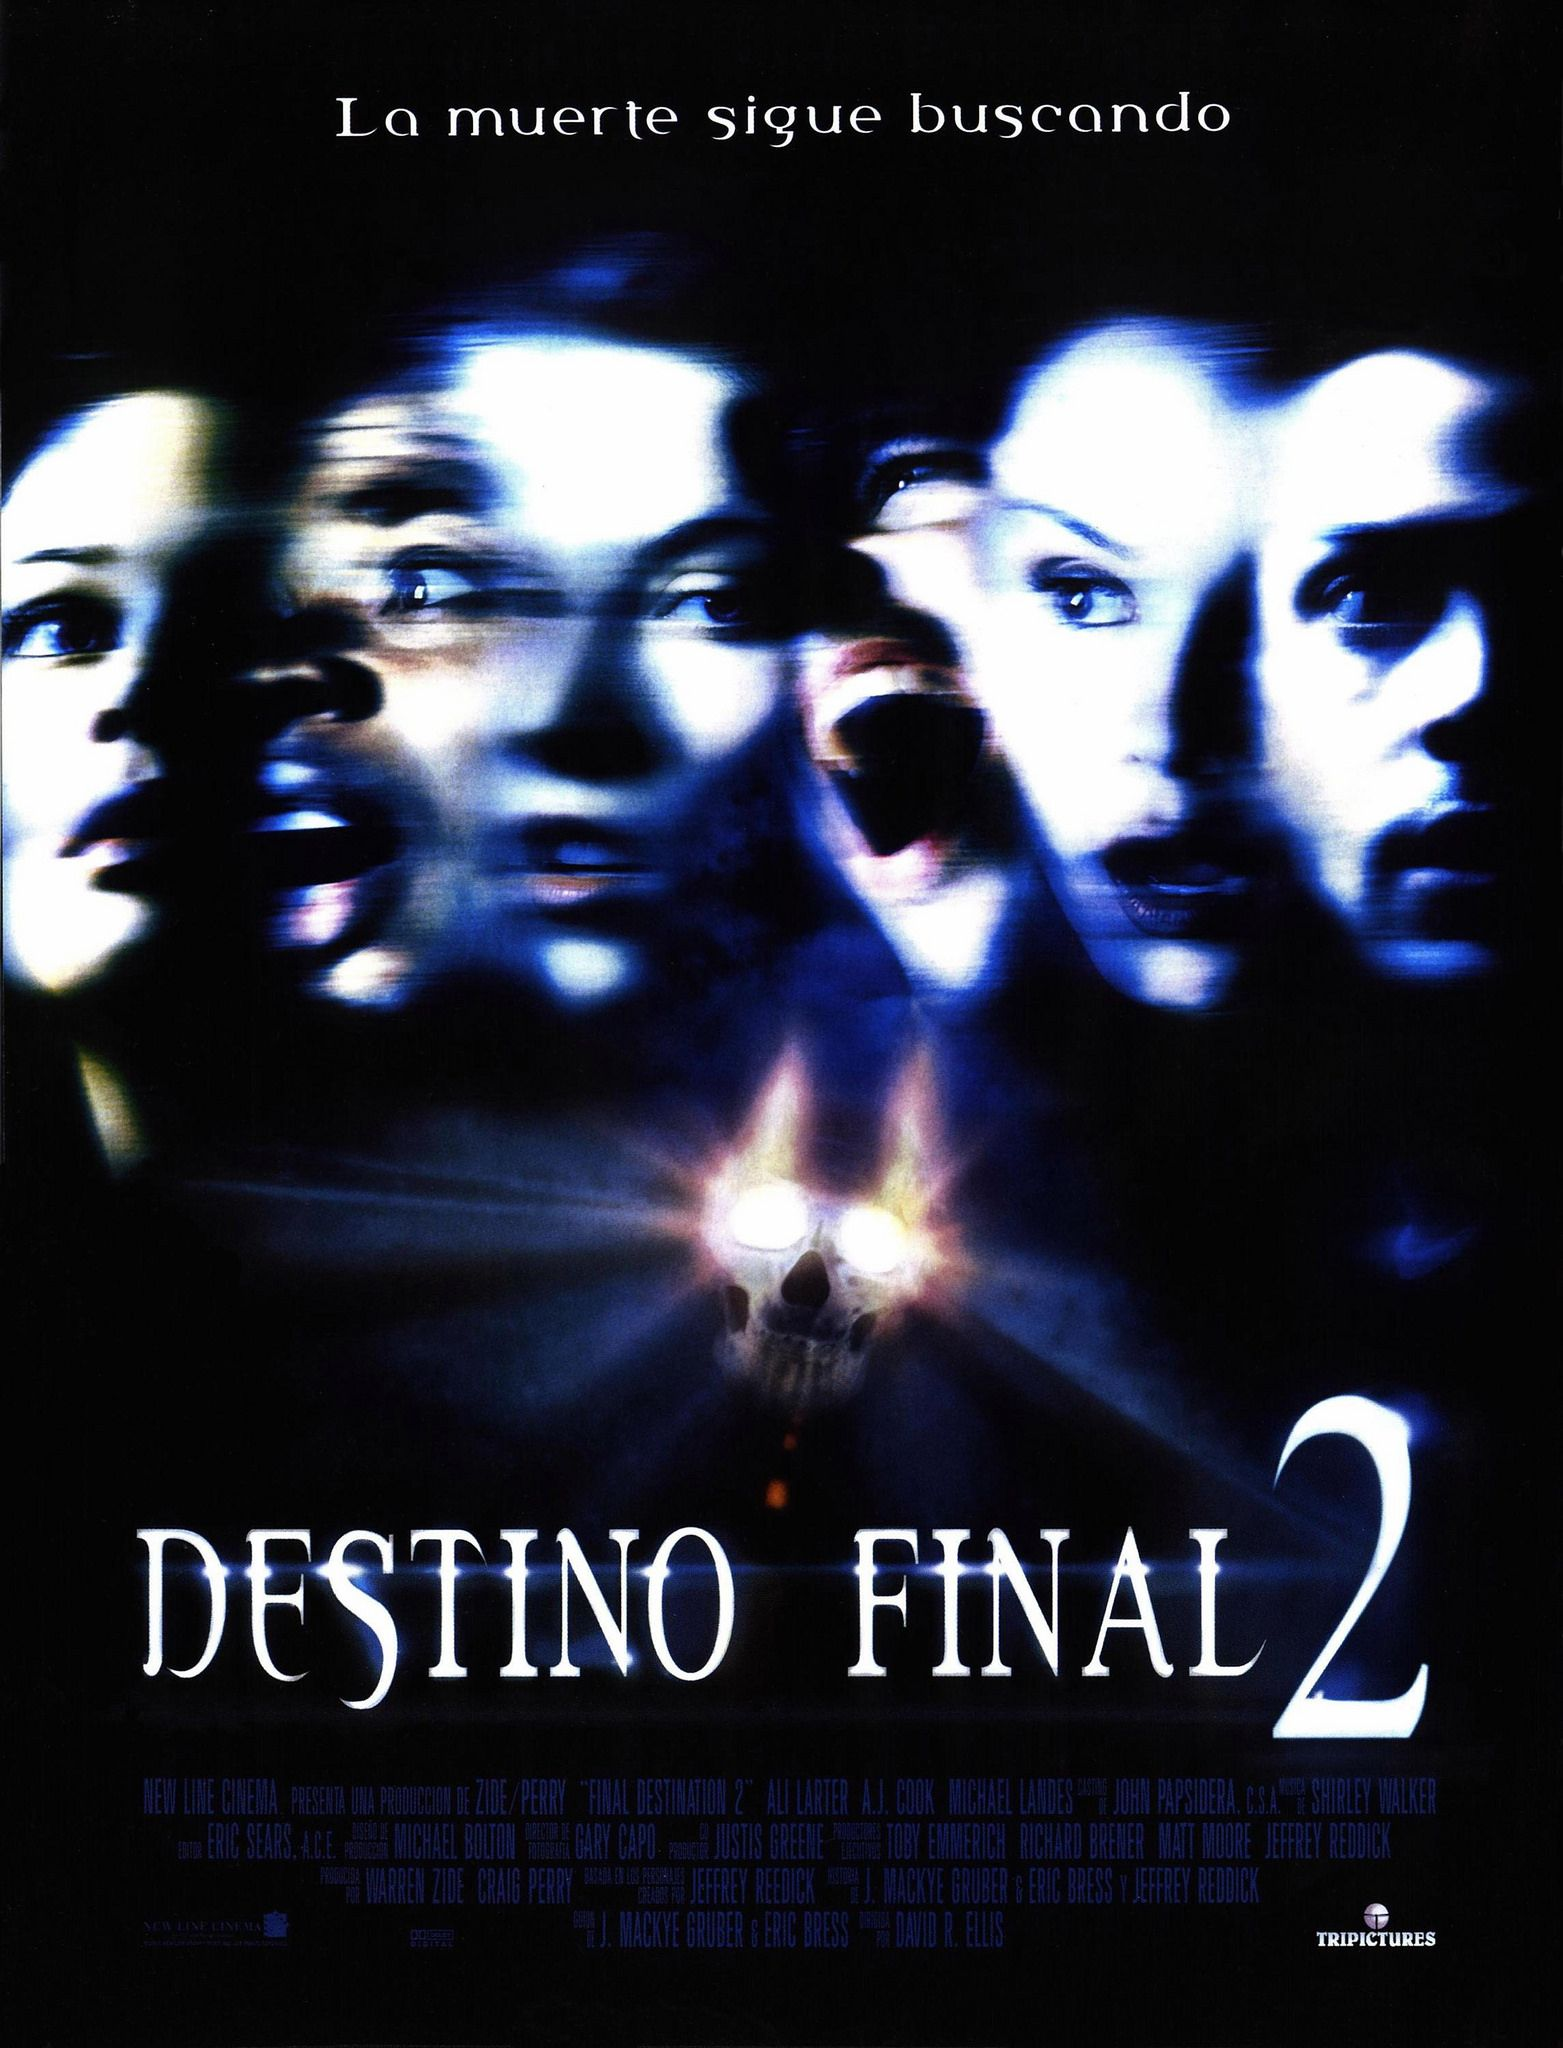 Destino Final 2 Destino Final 2 Peliculas De Terror Horror Movie Posters